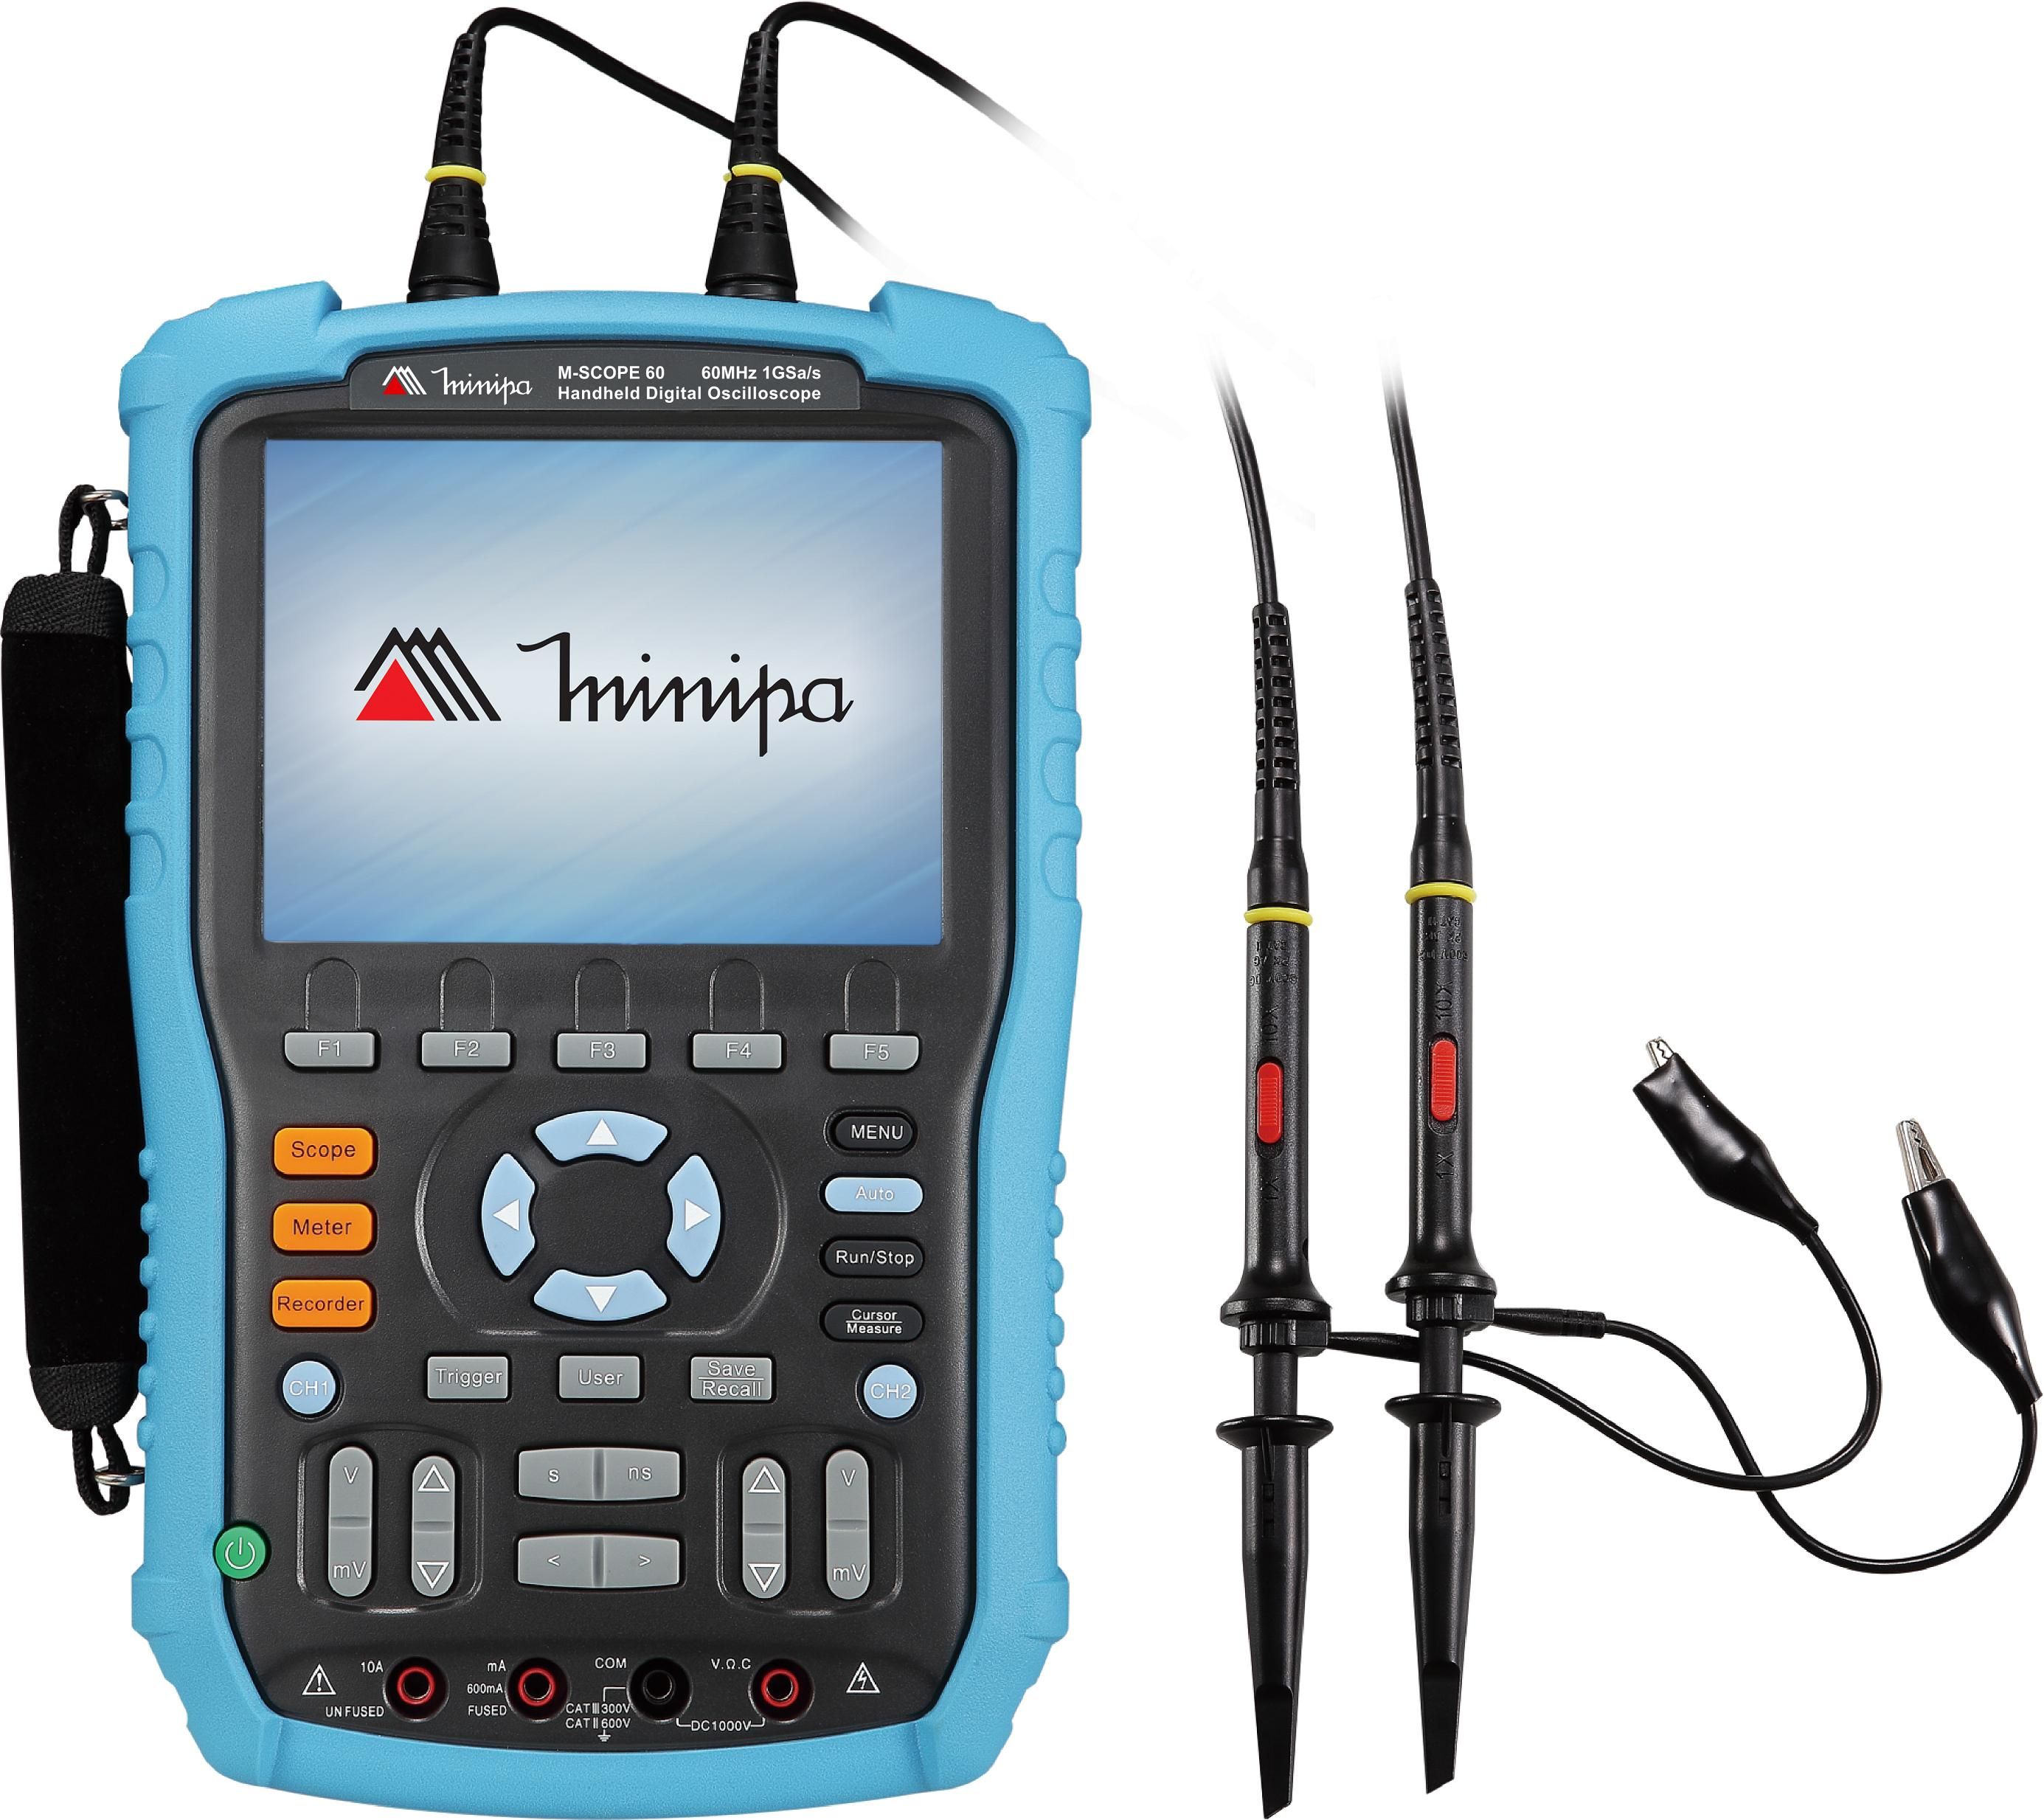 Osciloscópio/Multímetro Portátil 60MHz-2c-1GS/s-CAT III-USB - Minipa - MSCOPE-60